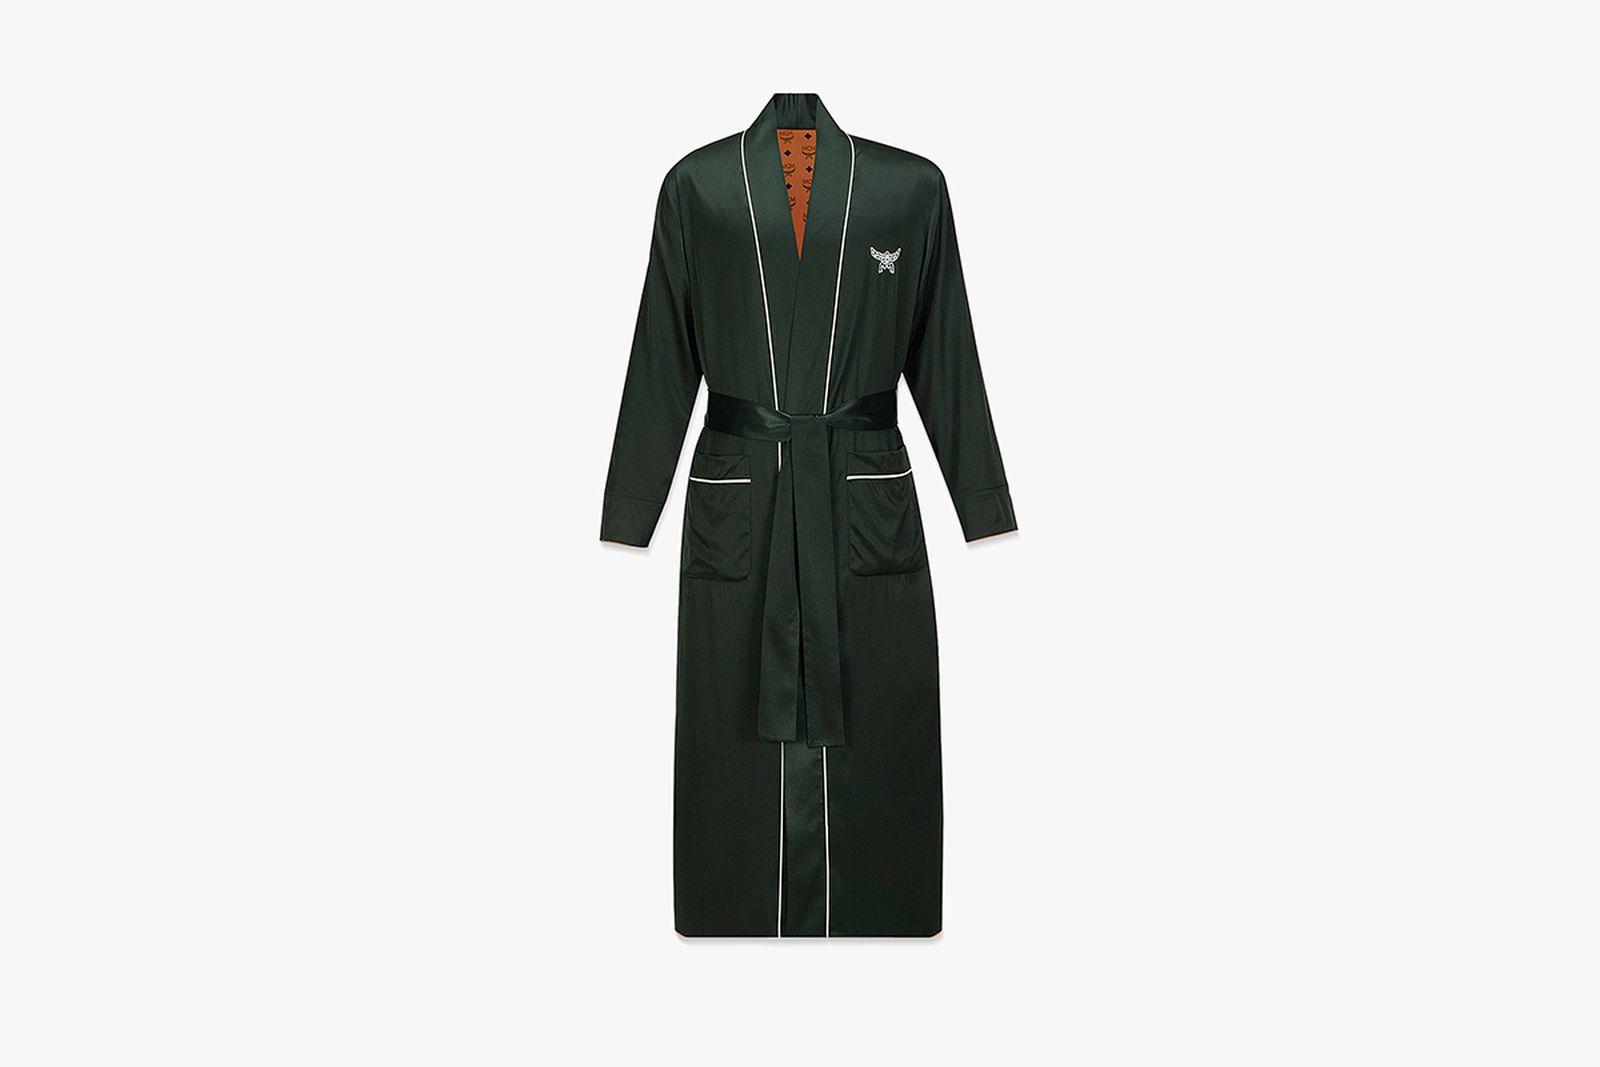 mcm-loungewear-02